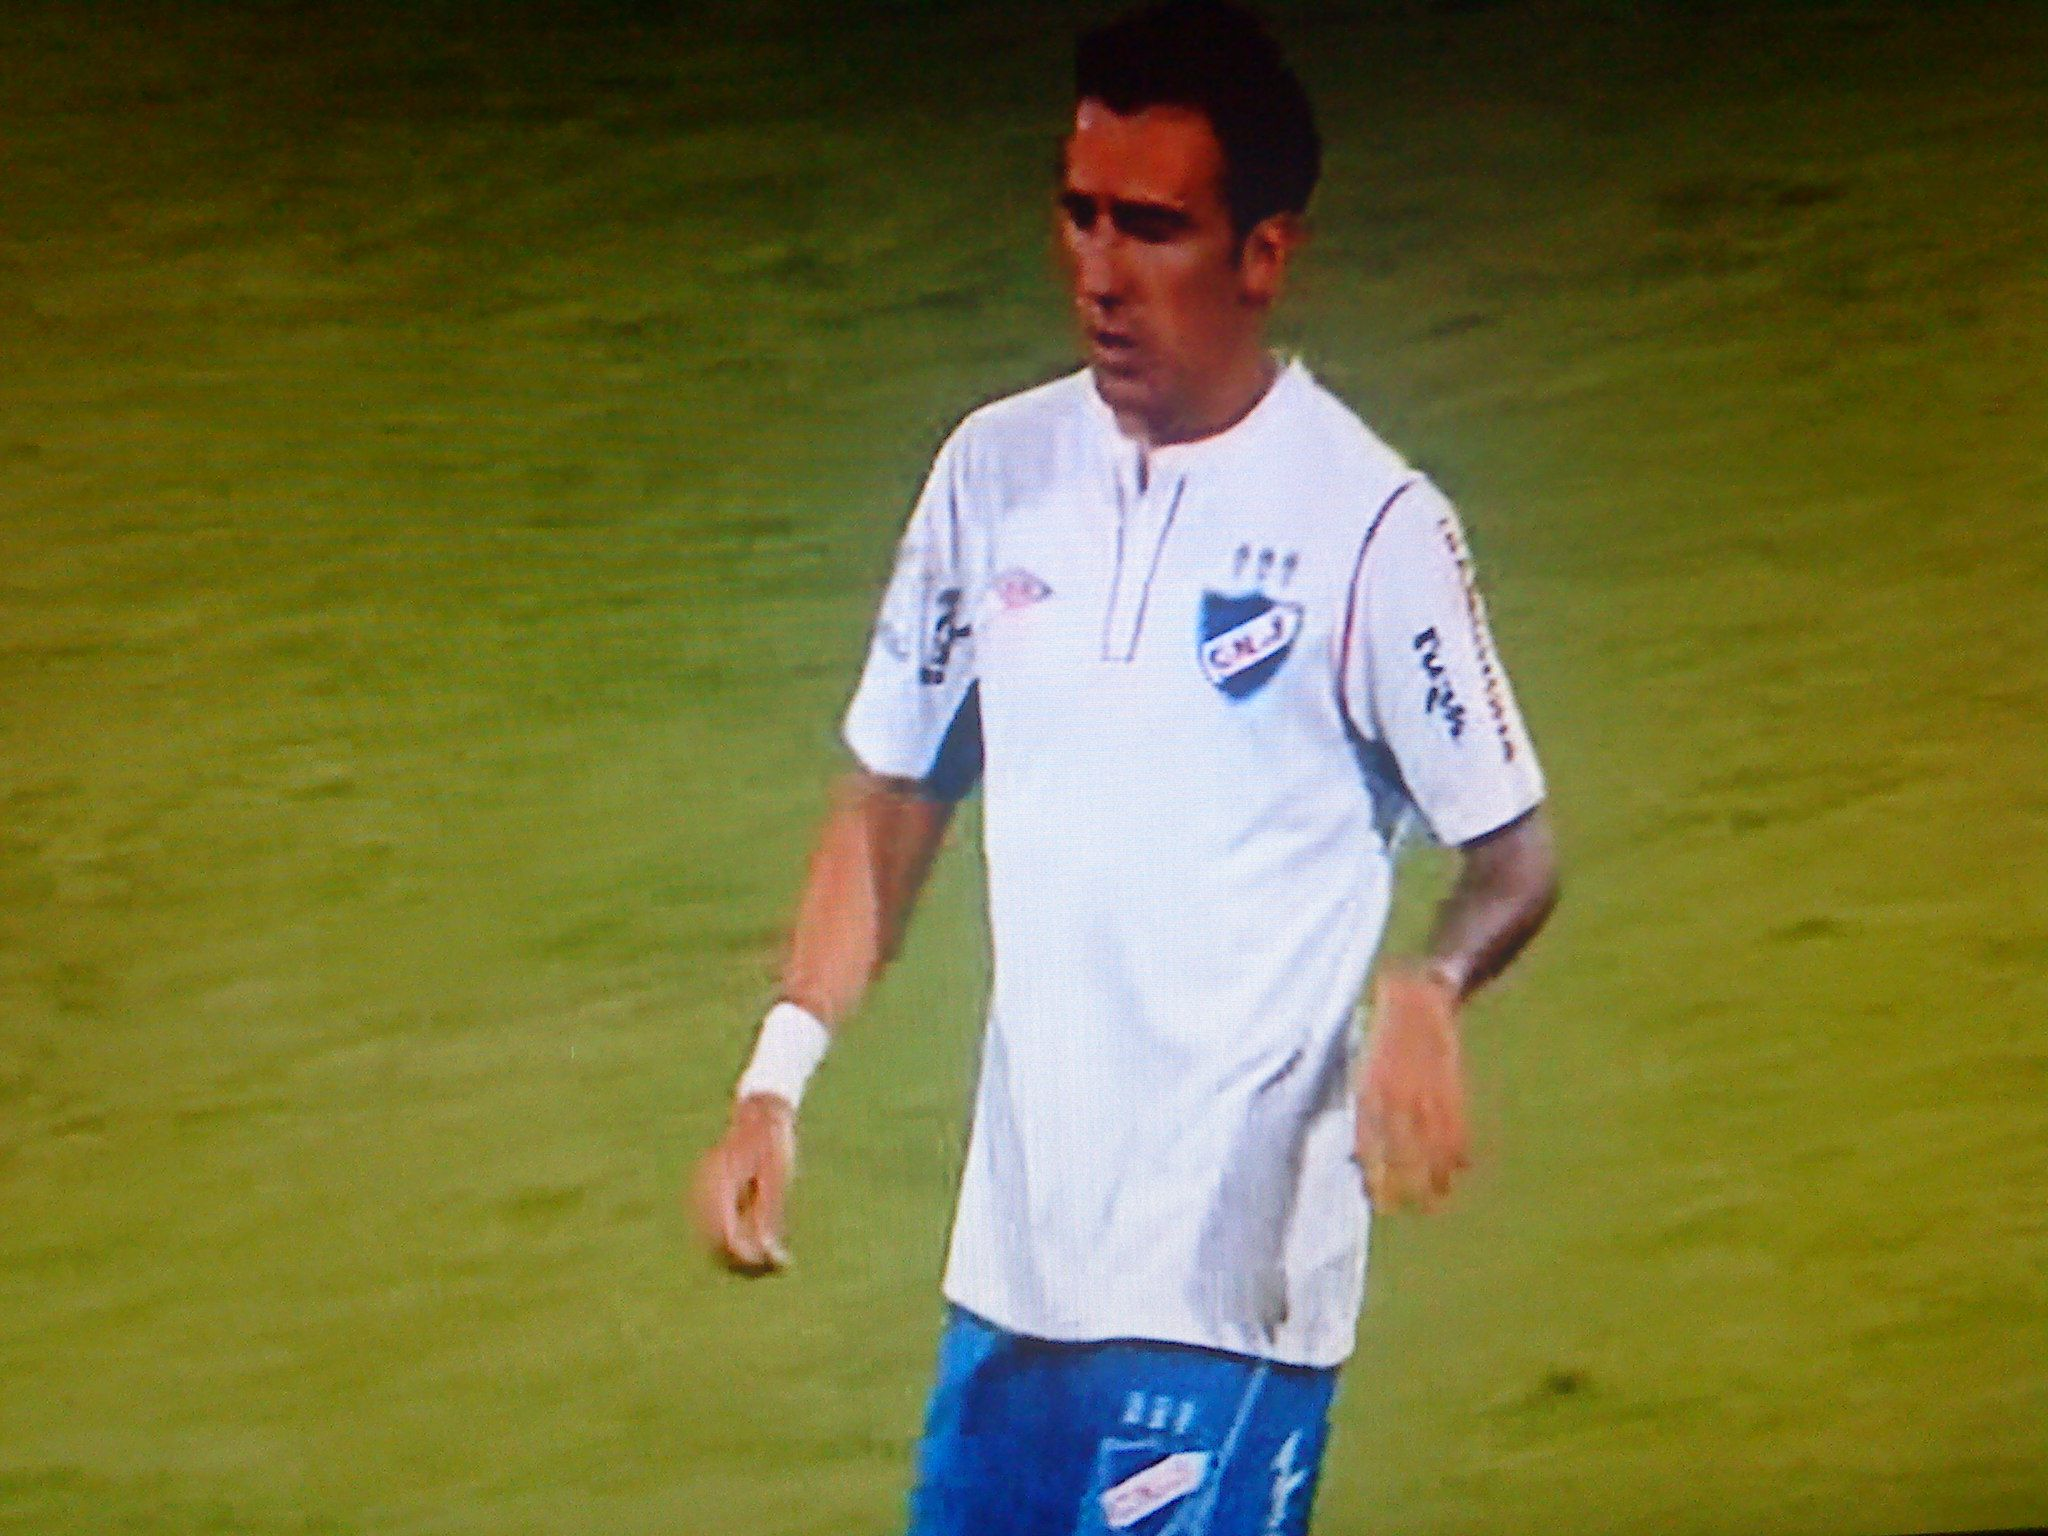 Vicente López un pedazo de jugador que juega en la Copa Libertadores 2013